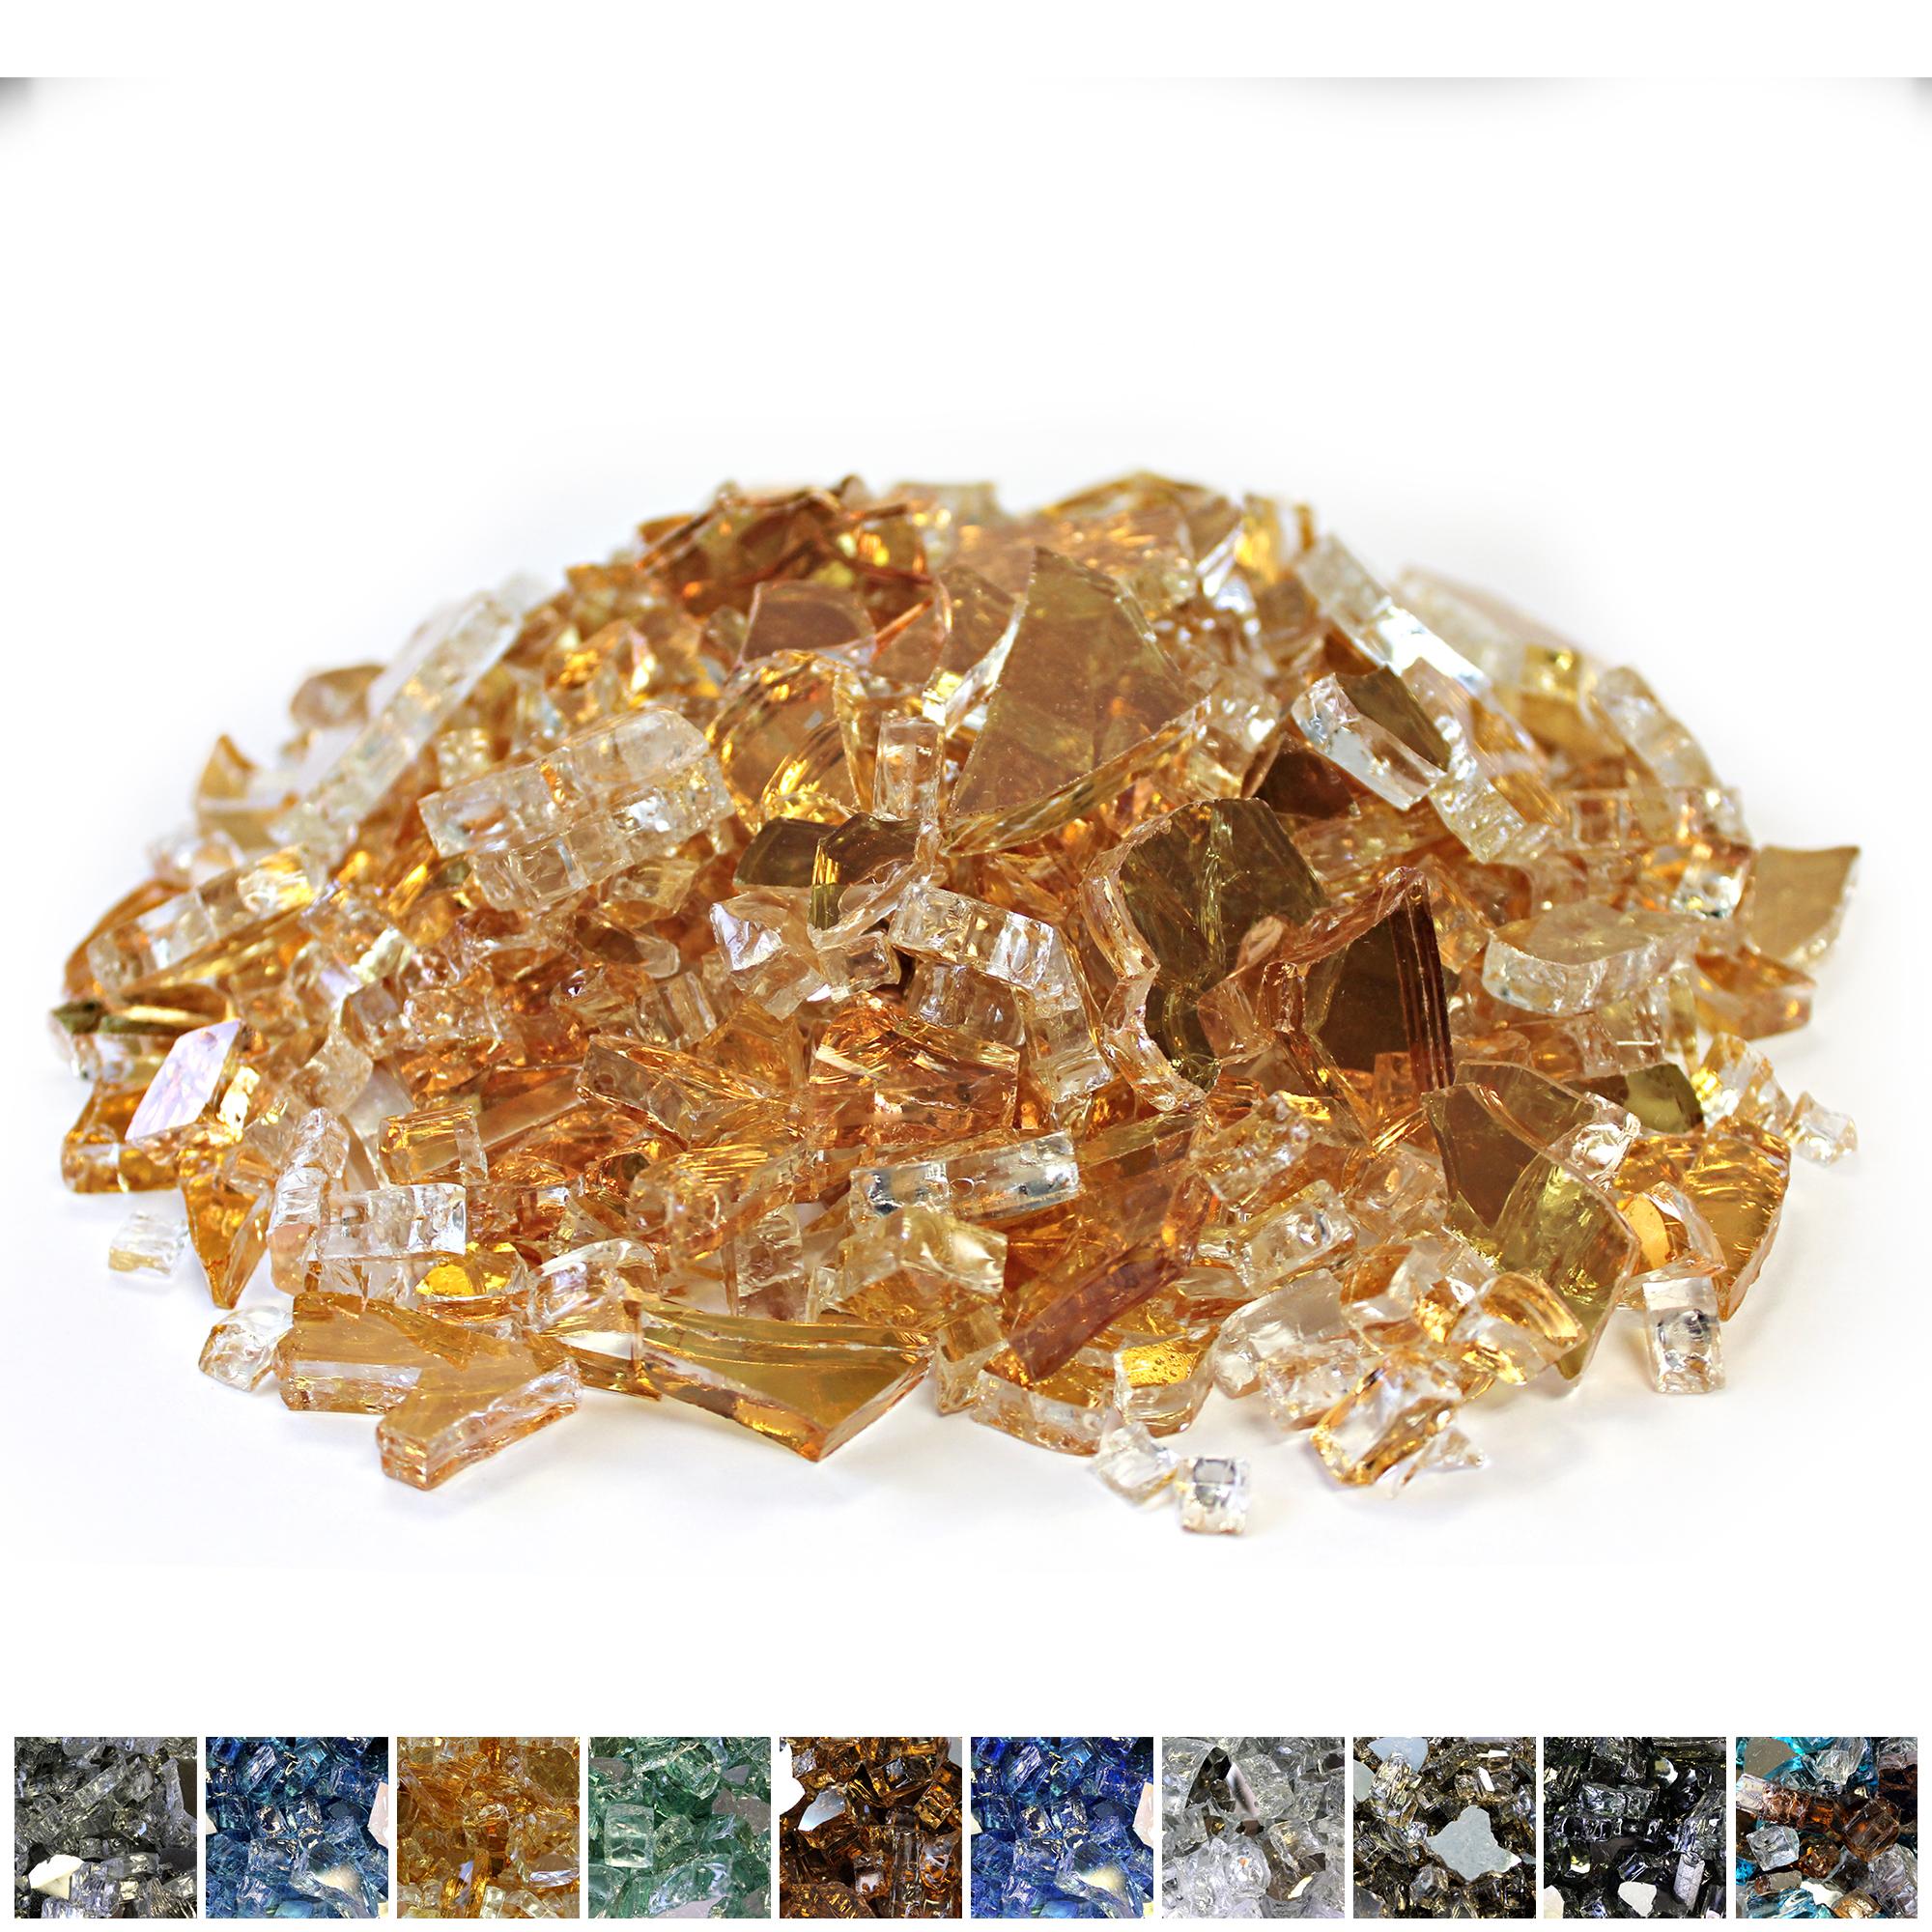 Gold 1/4 Reflective Fireglass - 10 lb bag -